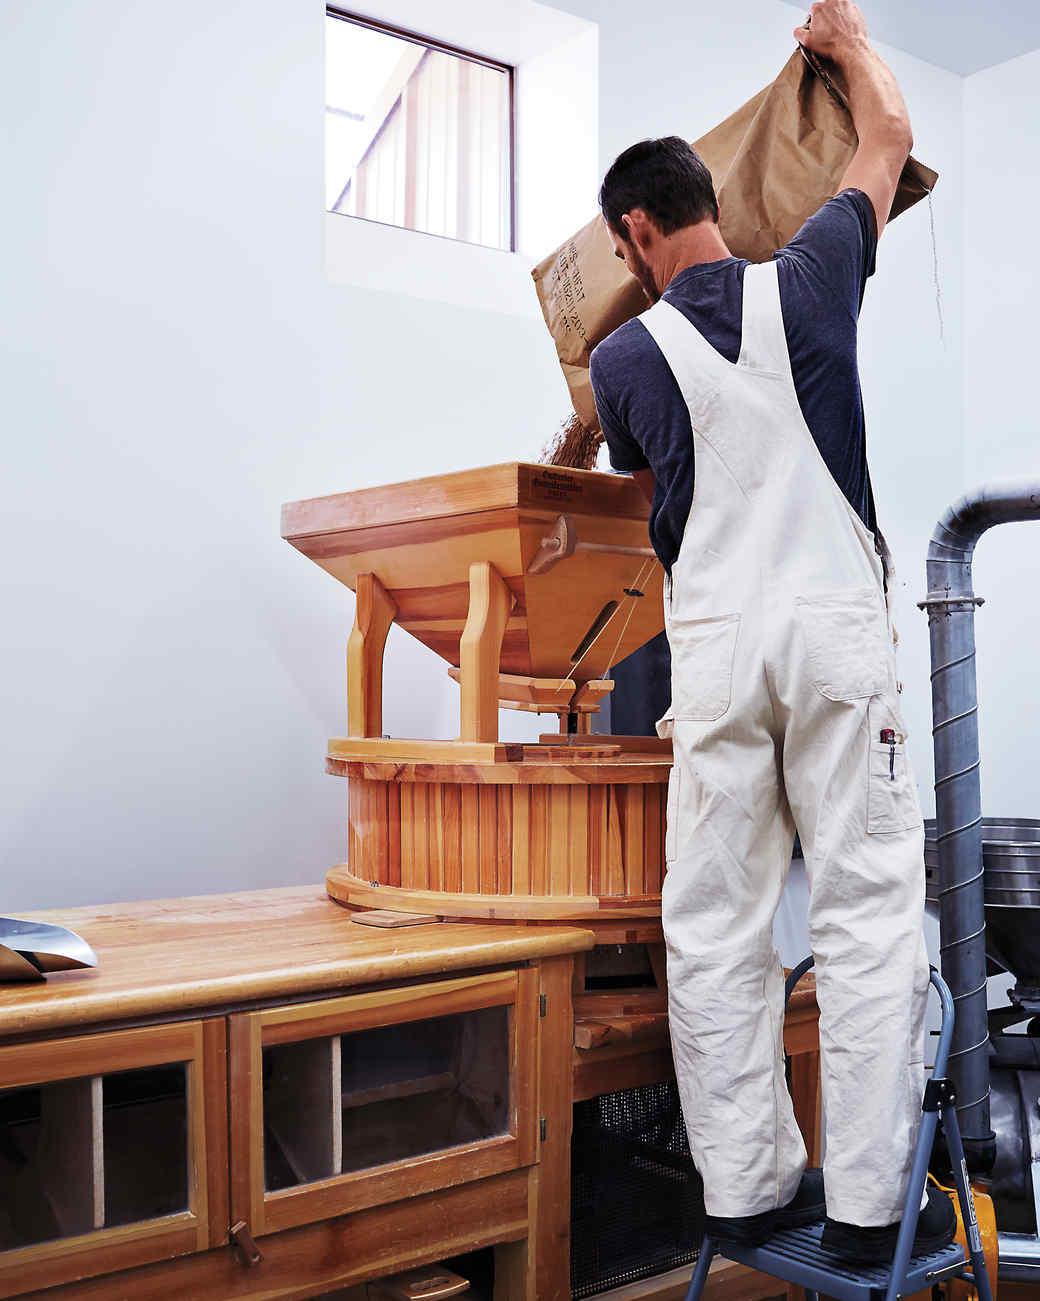 hayden-flour-mills-ben-mill-process-632-d112232.jpg